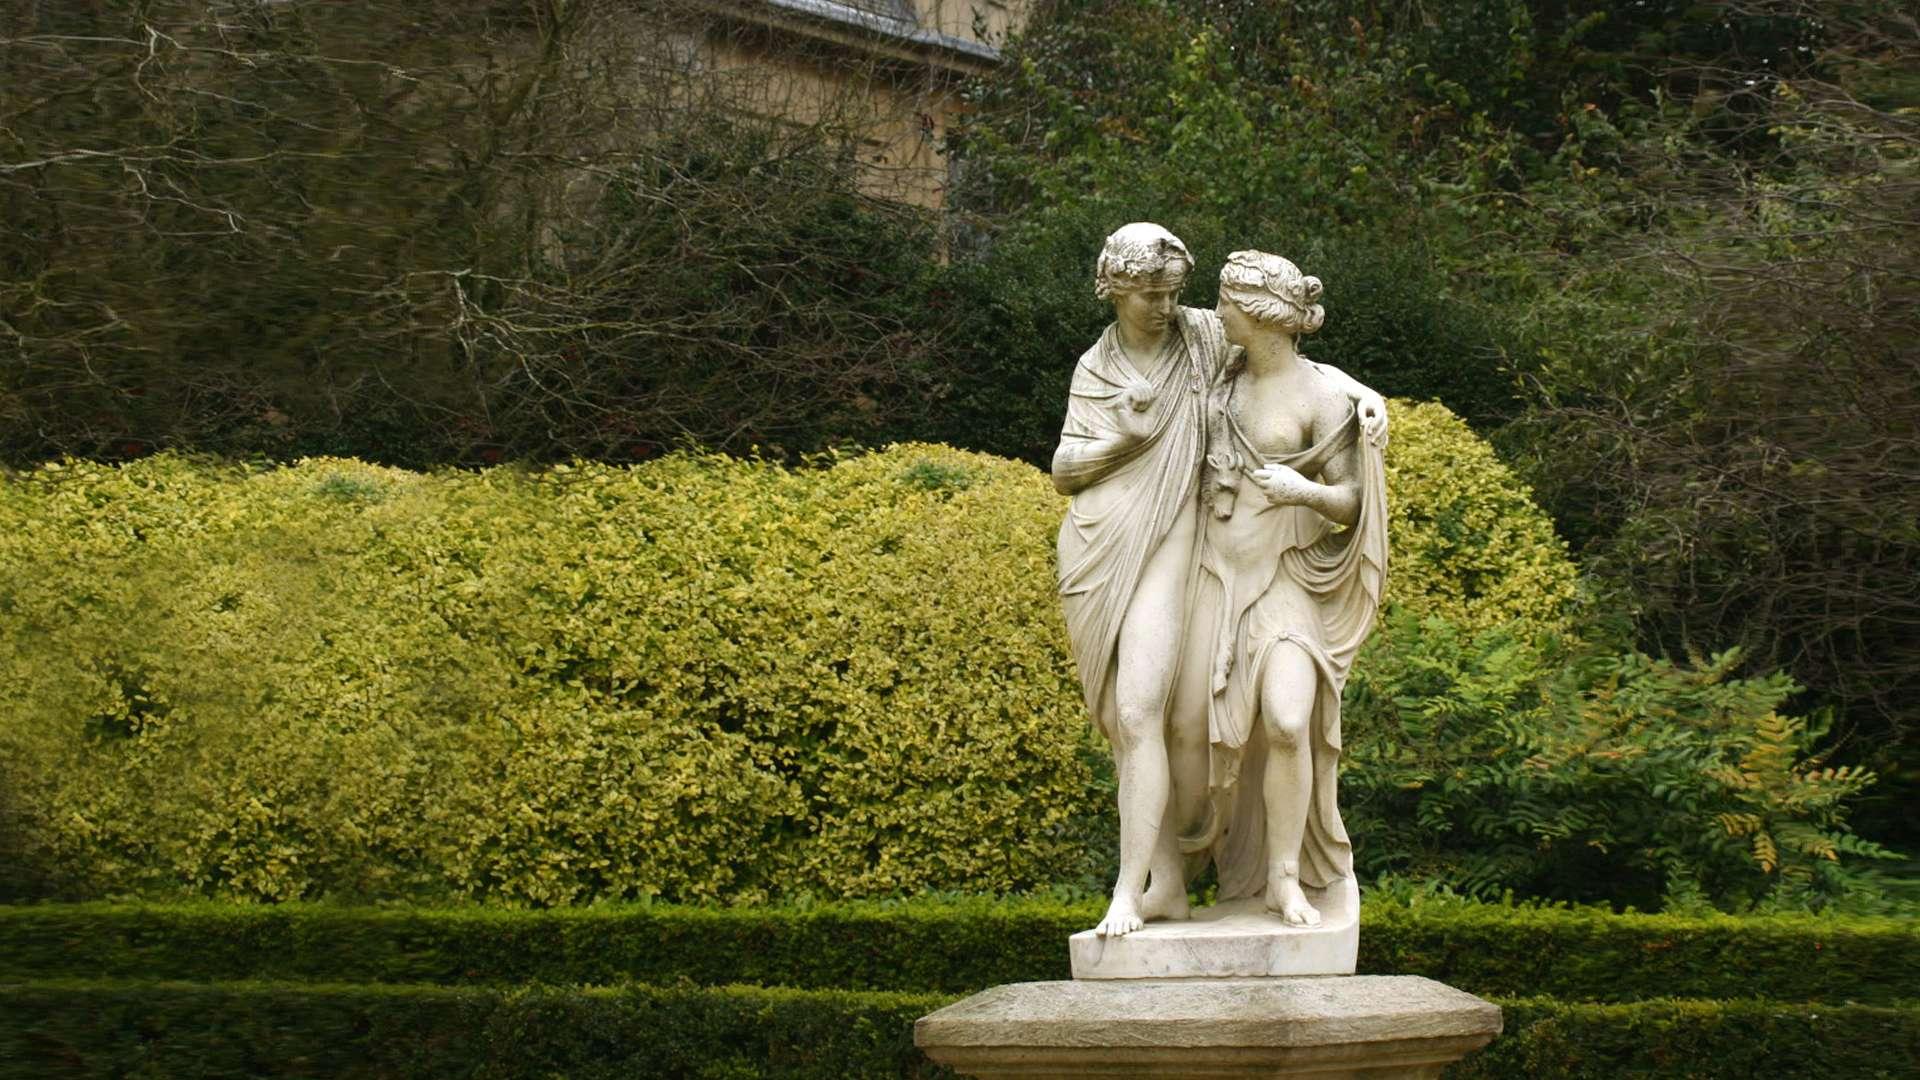 garden statue new england garden ornaments - welcome to the best source for garden QWHXKPZ